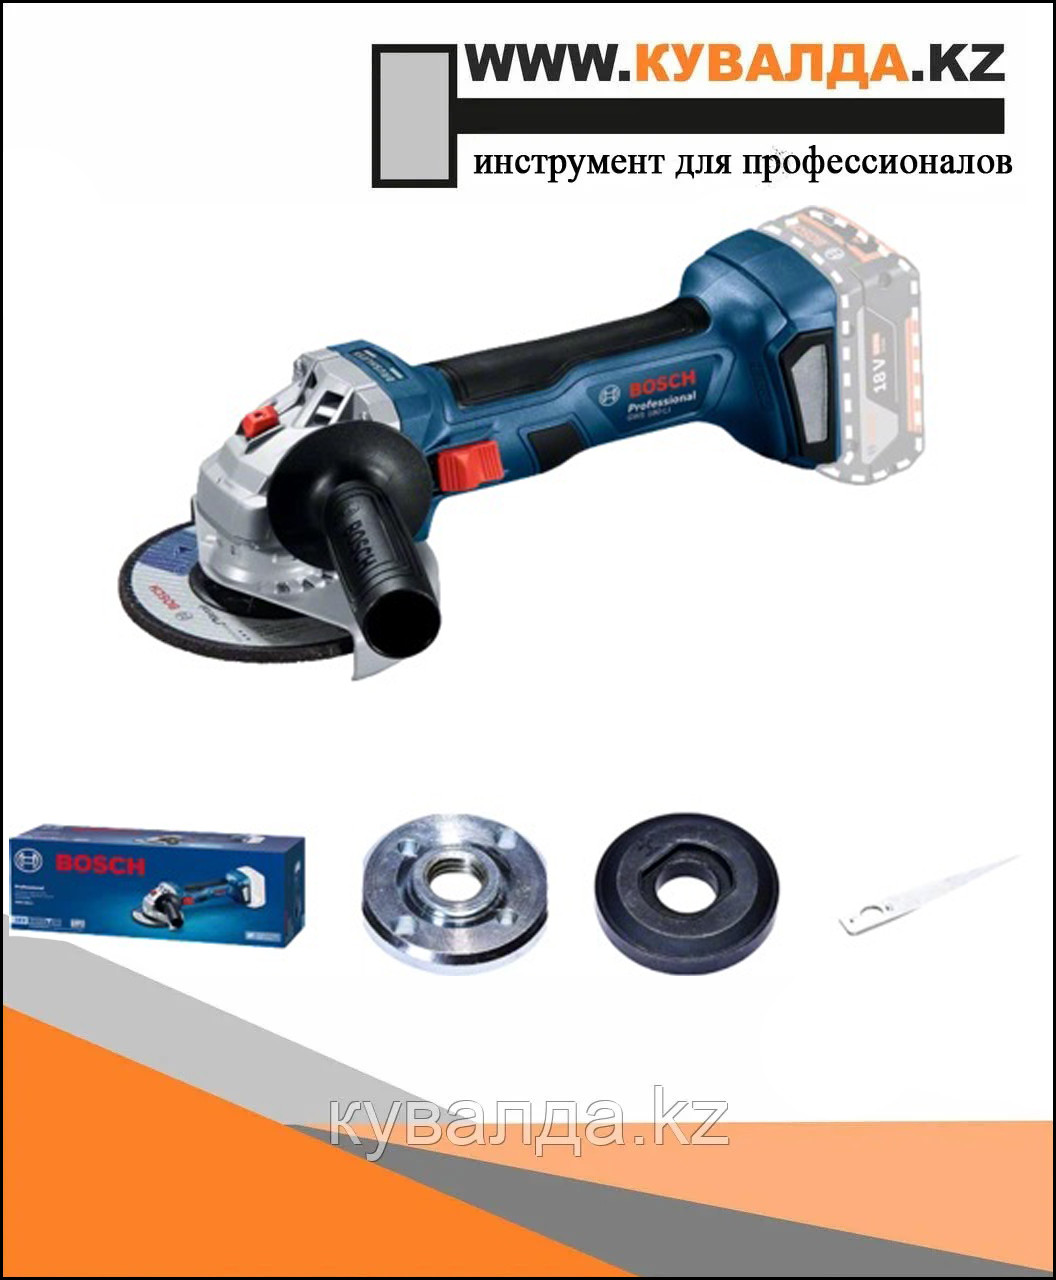 Аккумуляторная УШМ (болгарка) Bosch GWS 180-LI